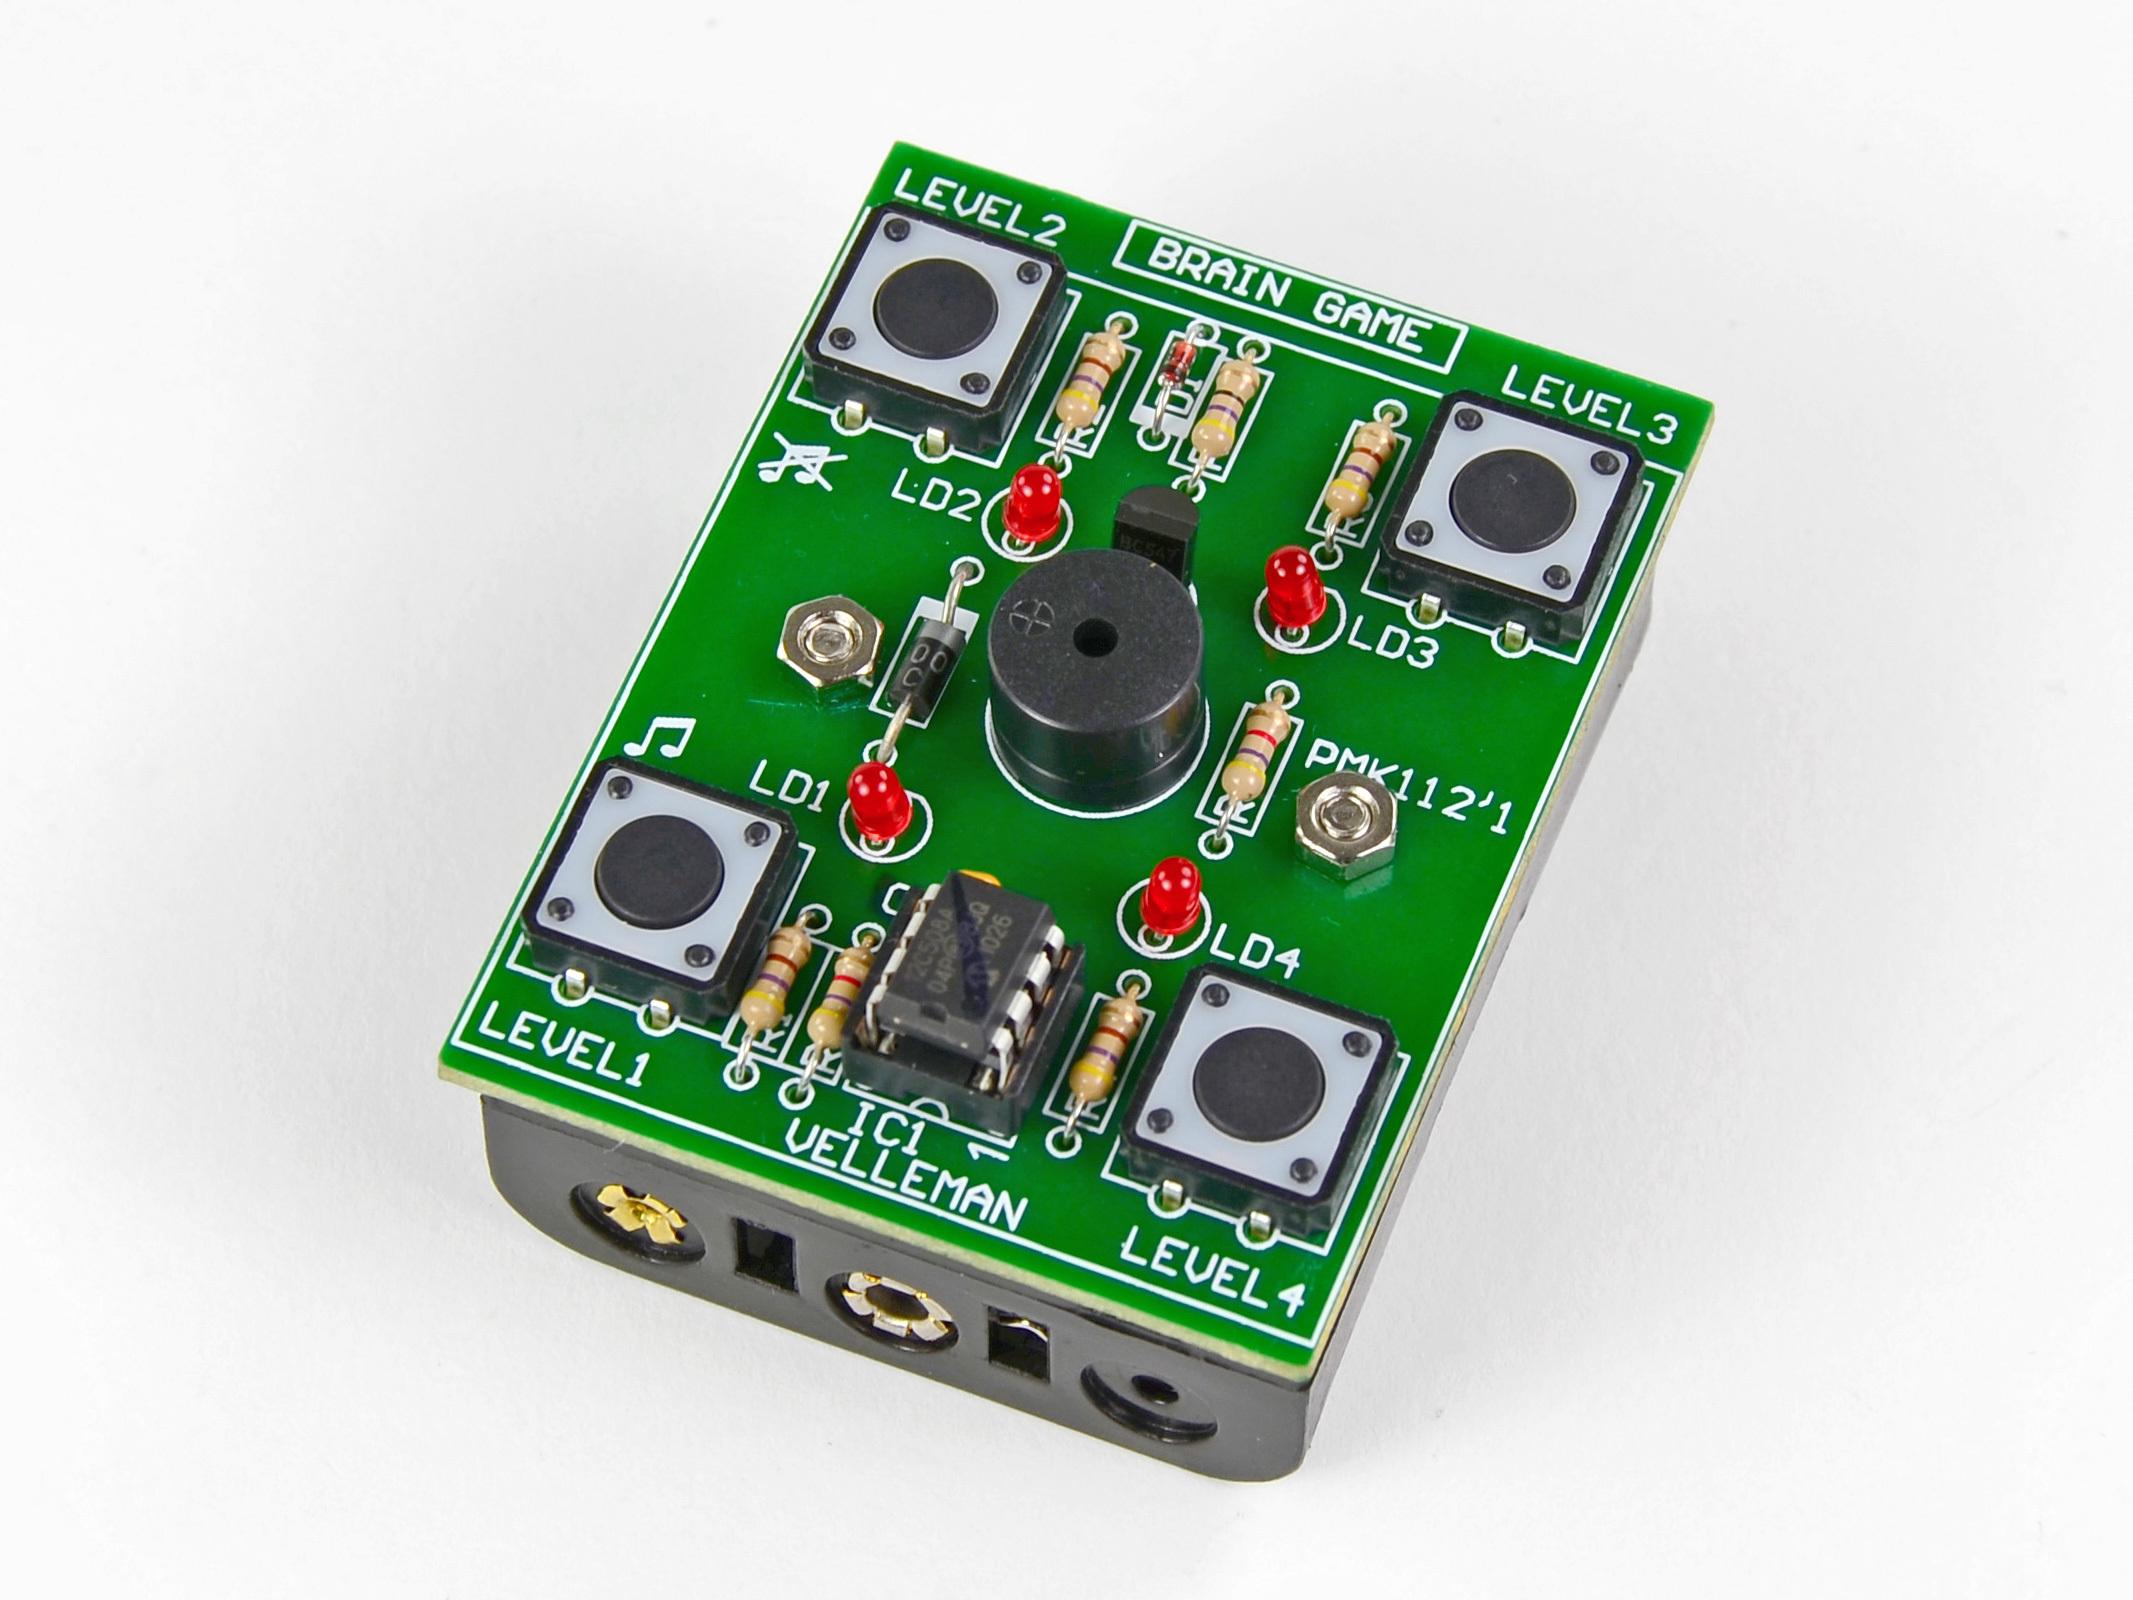 Electronics Skills Kit 101 Ifixit Repair Guide Repairs All Types Of Printed Circuit Boards Pc